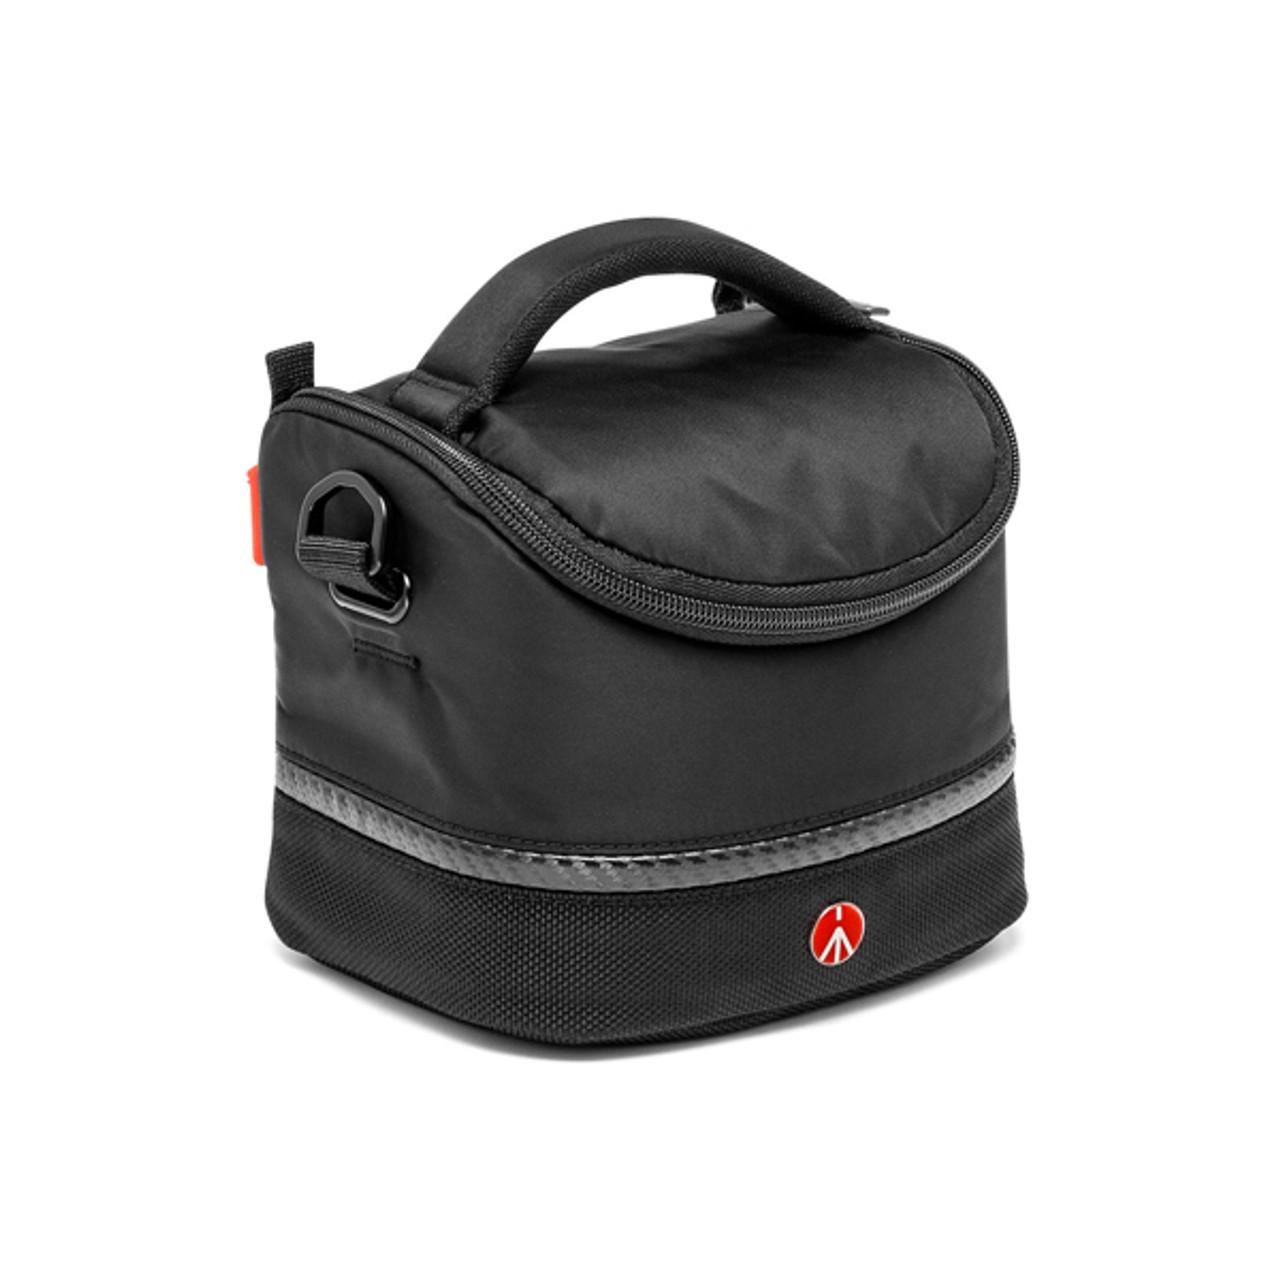 Advanced Manfrotto Advanced Manfrotto Bag Ii Shoulder Qtrshd